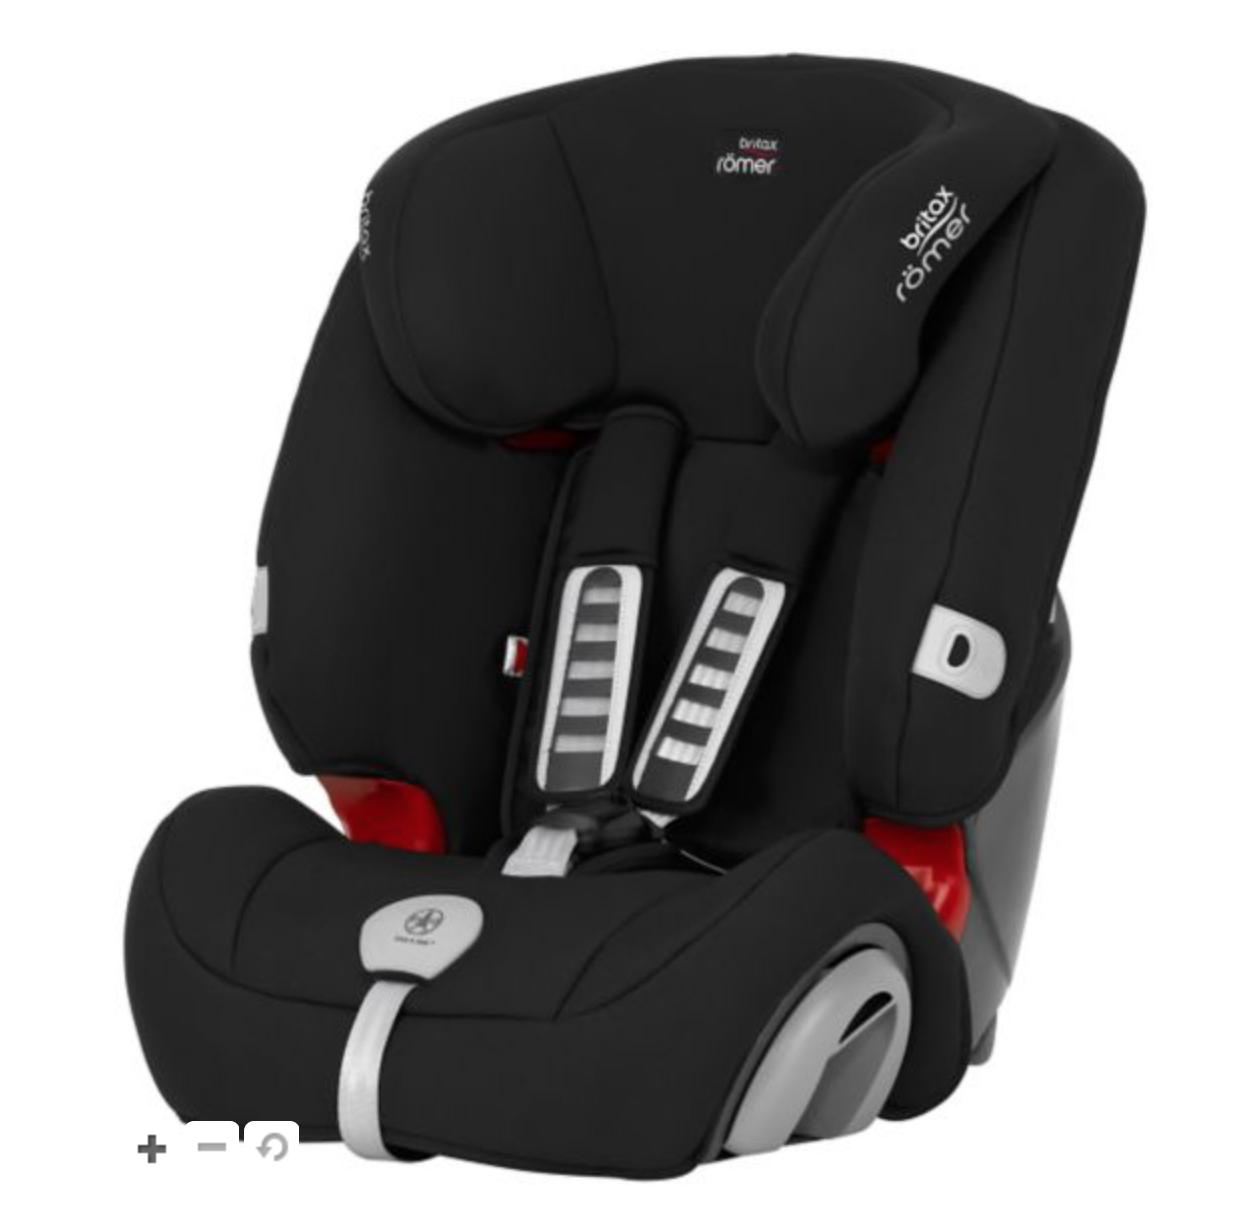 Britax Romer Evolva Plus 123 car seat at Boots for £89.99